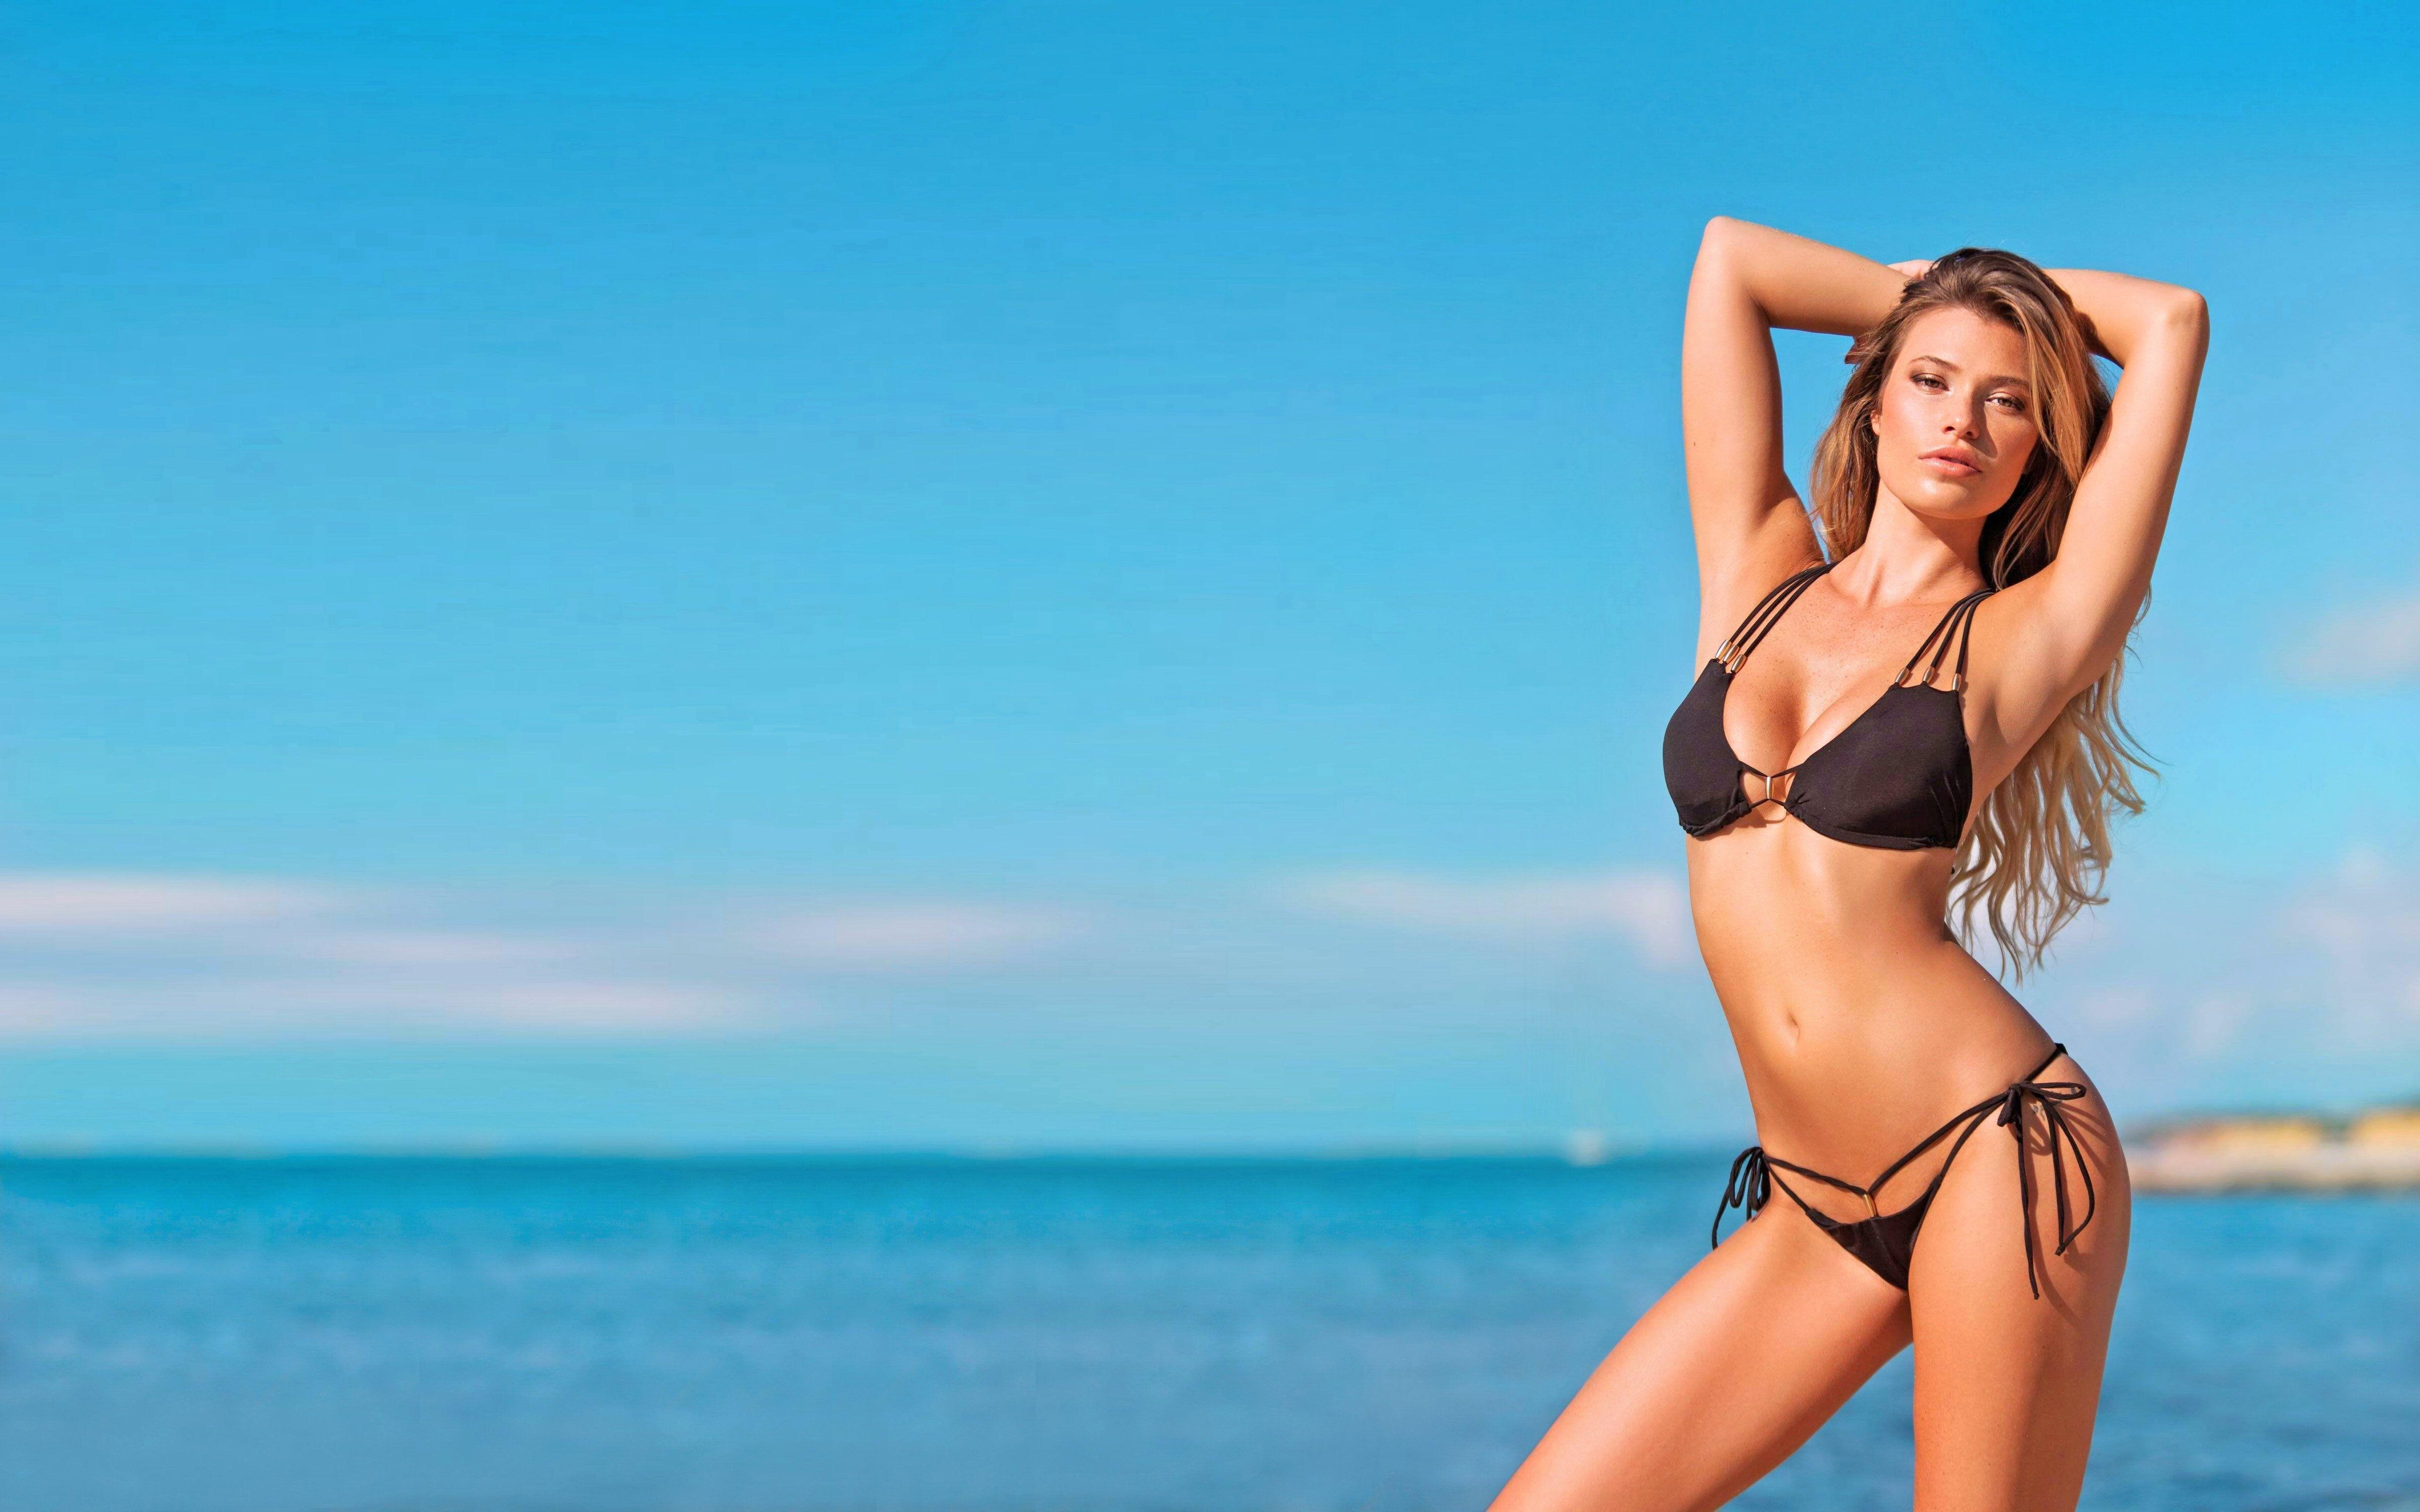 Butch C. reccomend Free bikini model wallpapers